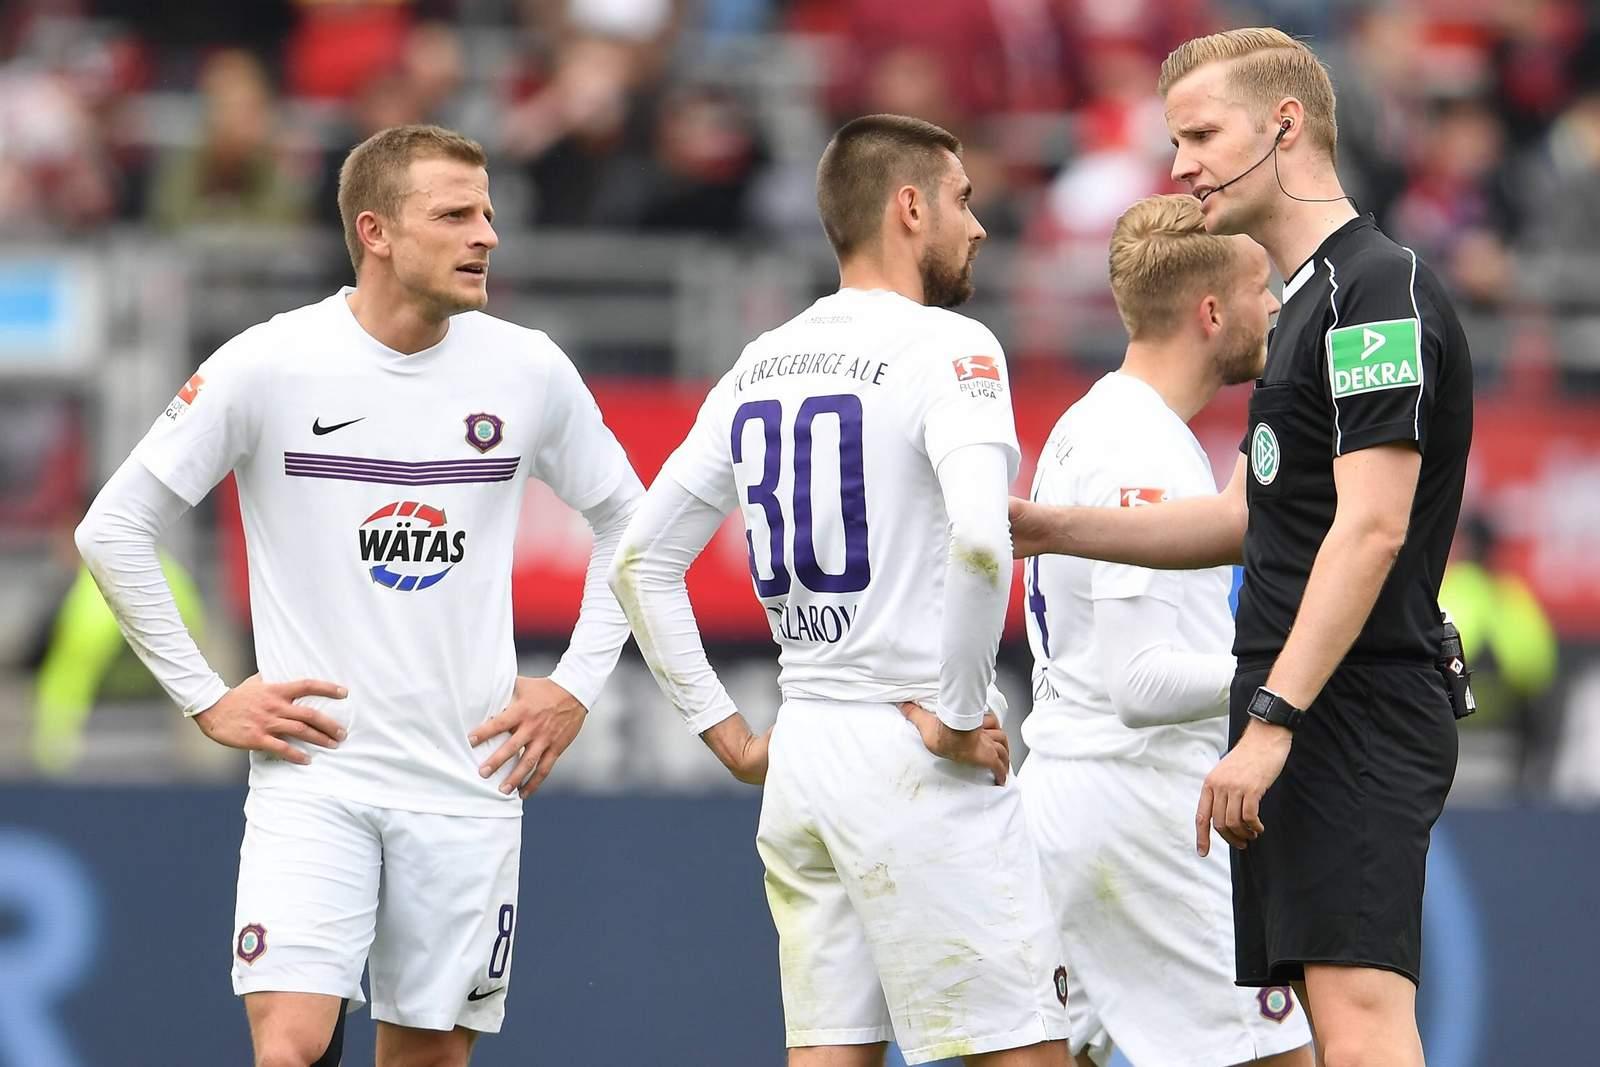 Schiedsrichter Arne Aarnink verweigerte Aue zwei Elfmeter.